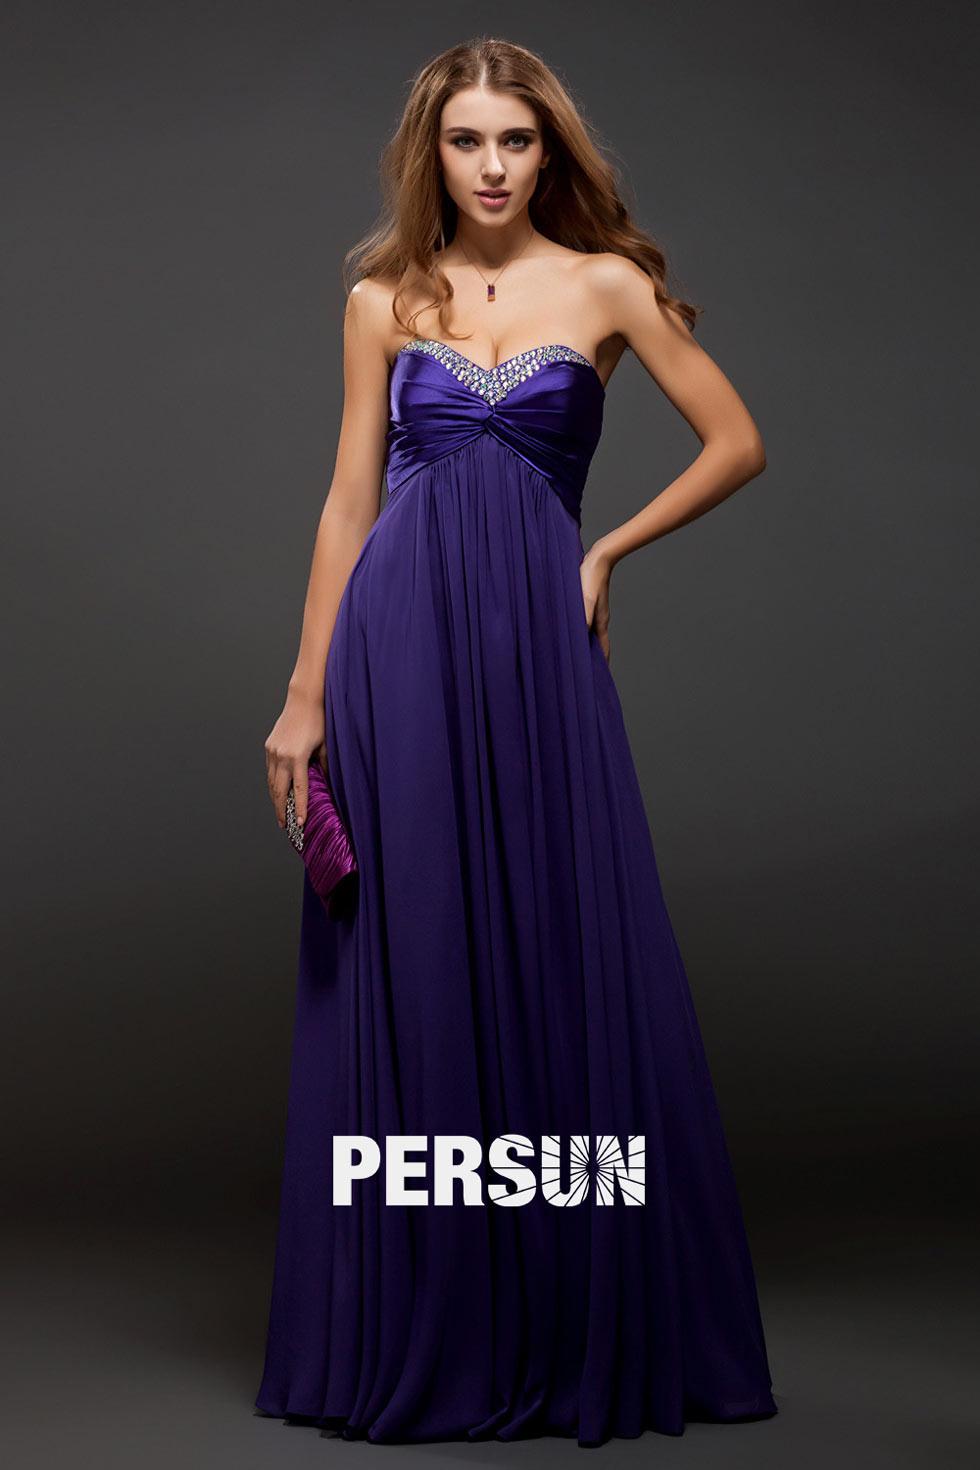 Designer Großartig Abendkleid Carmen Ausschnitt Lang Galerie17 Kreativ Abendkleid Carmen Ausschnitt Lang Vertrieb